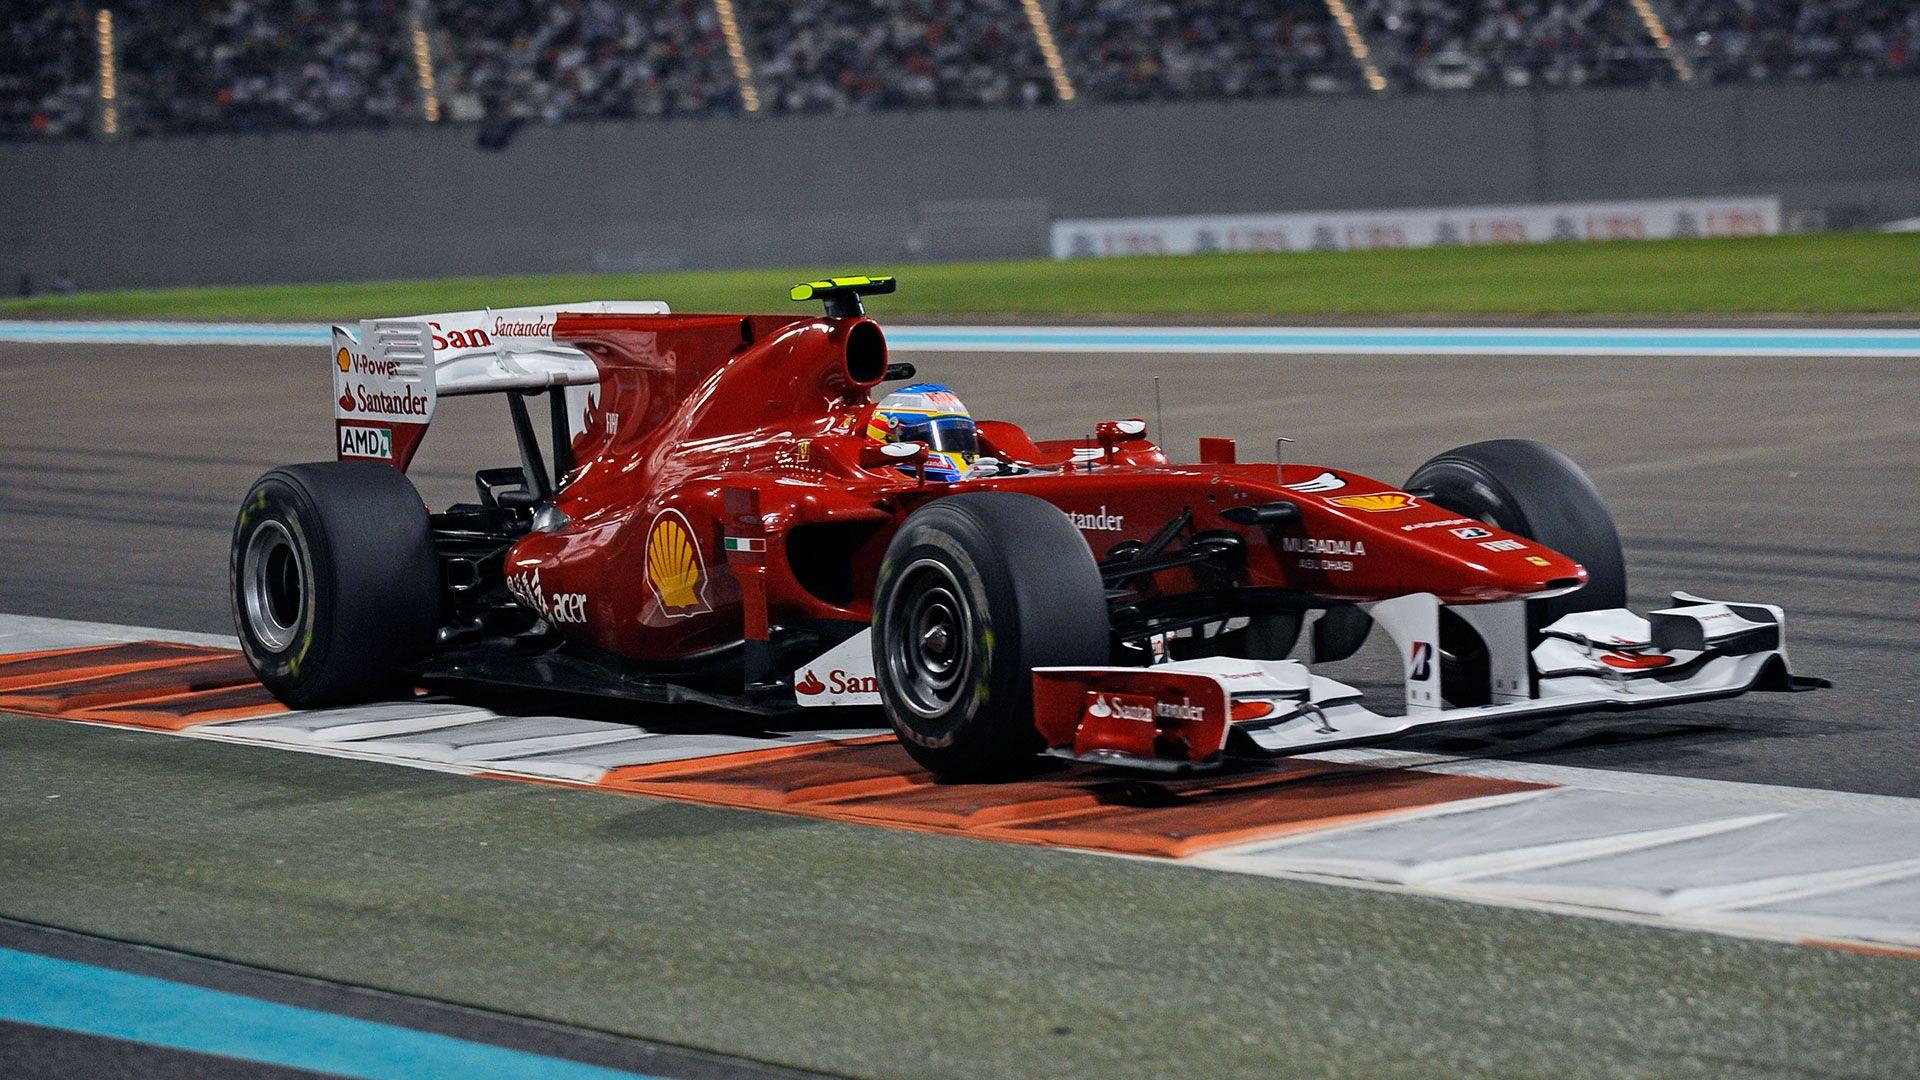 HD Wallpapers 2010 Formula 1 Grand Prix of Abu Dhabi F1